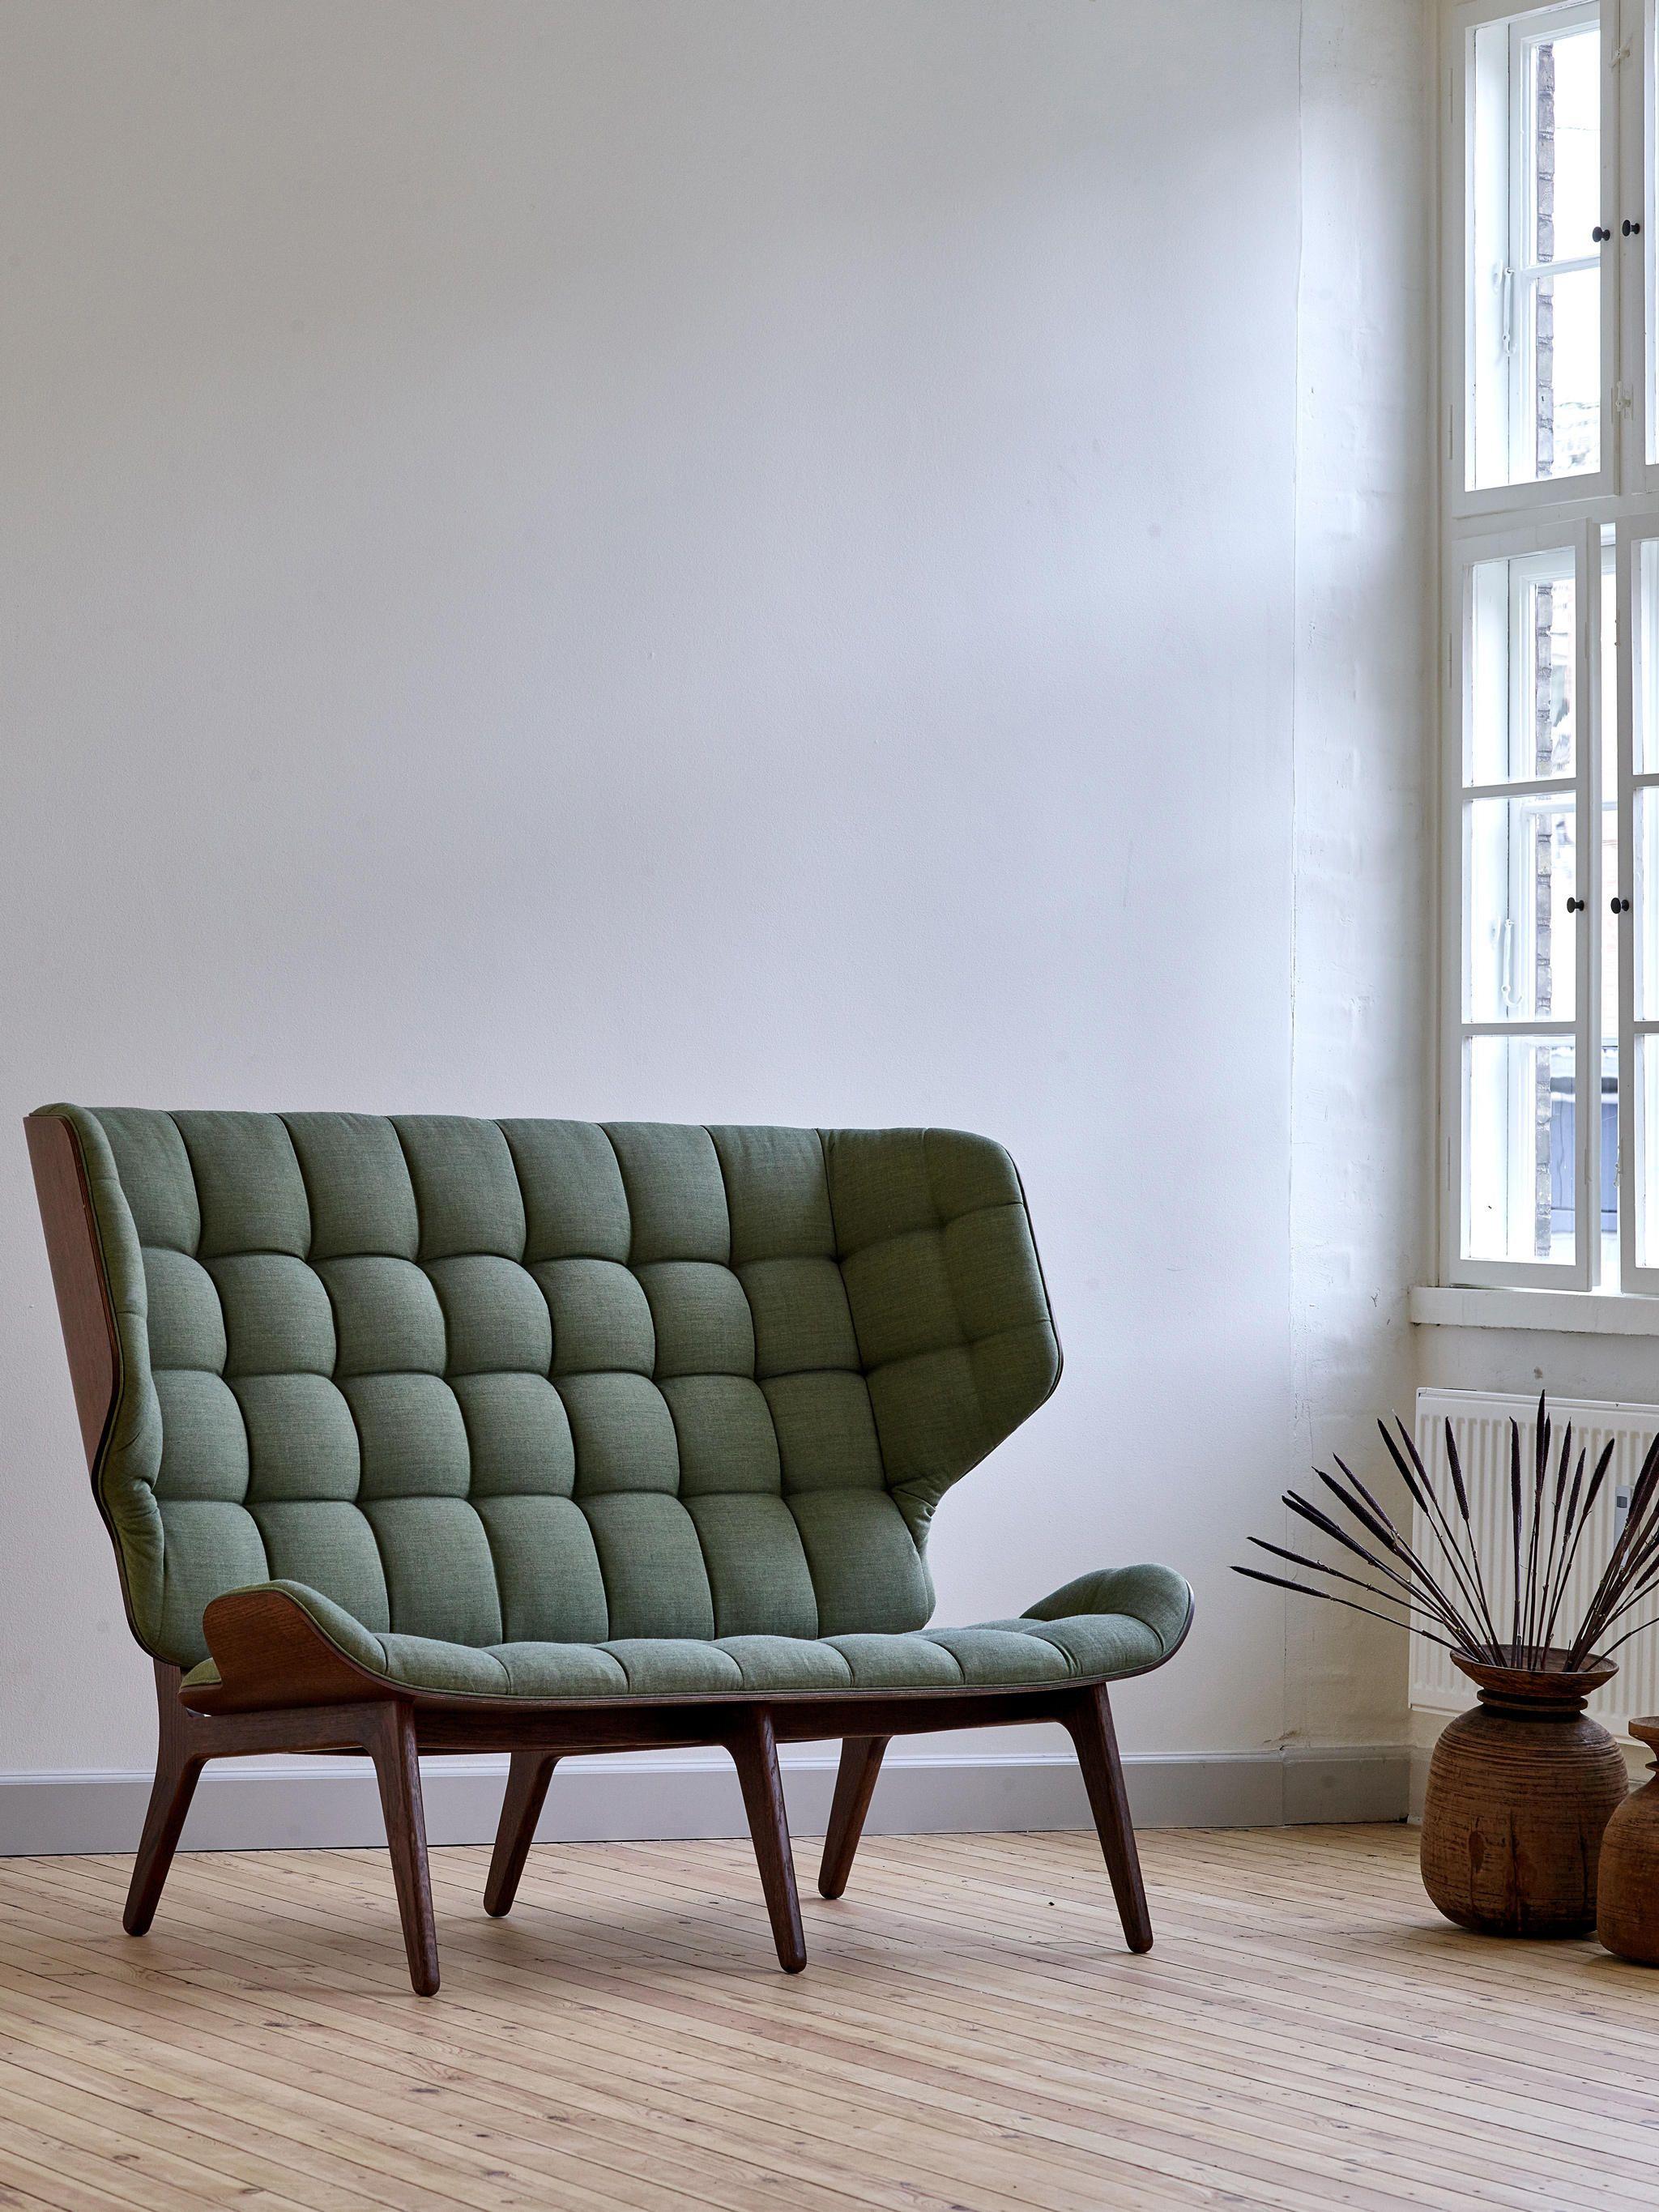 MAMMOTH SOFA, DARK STAINED / KVADRAT : - Designer Lounge sofas from ...